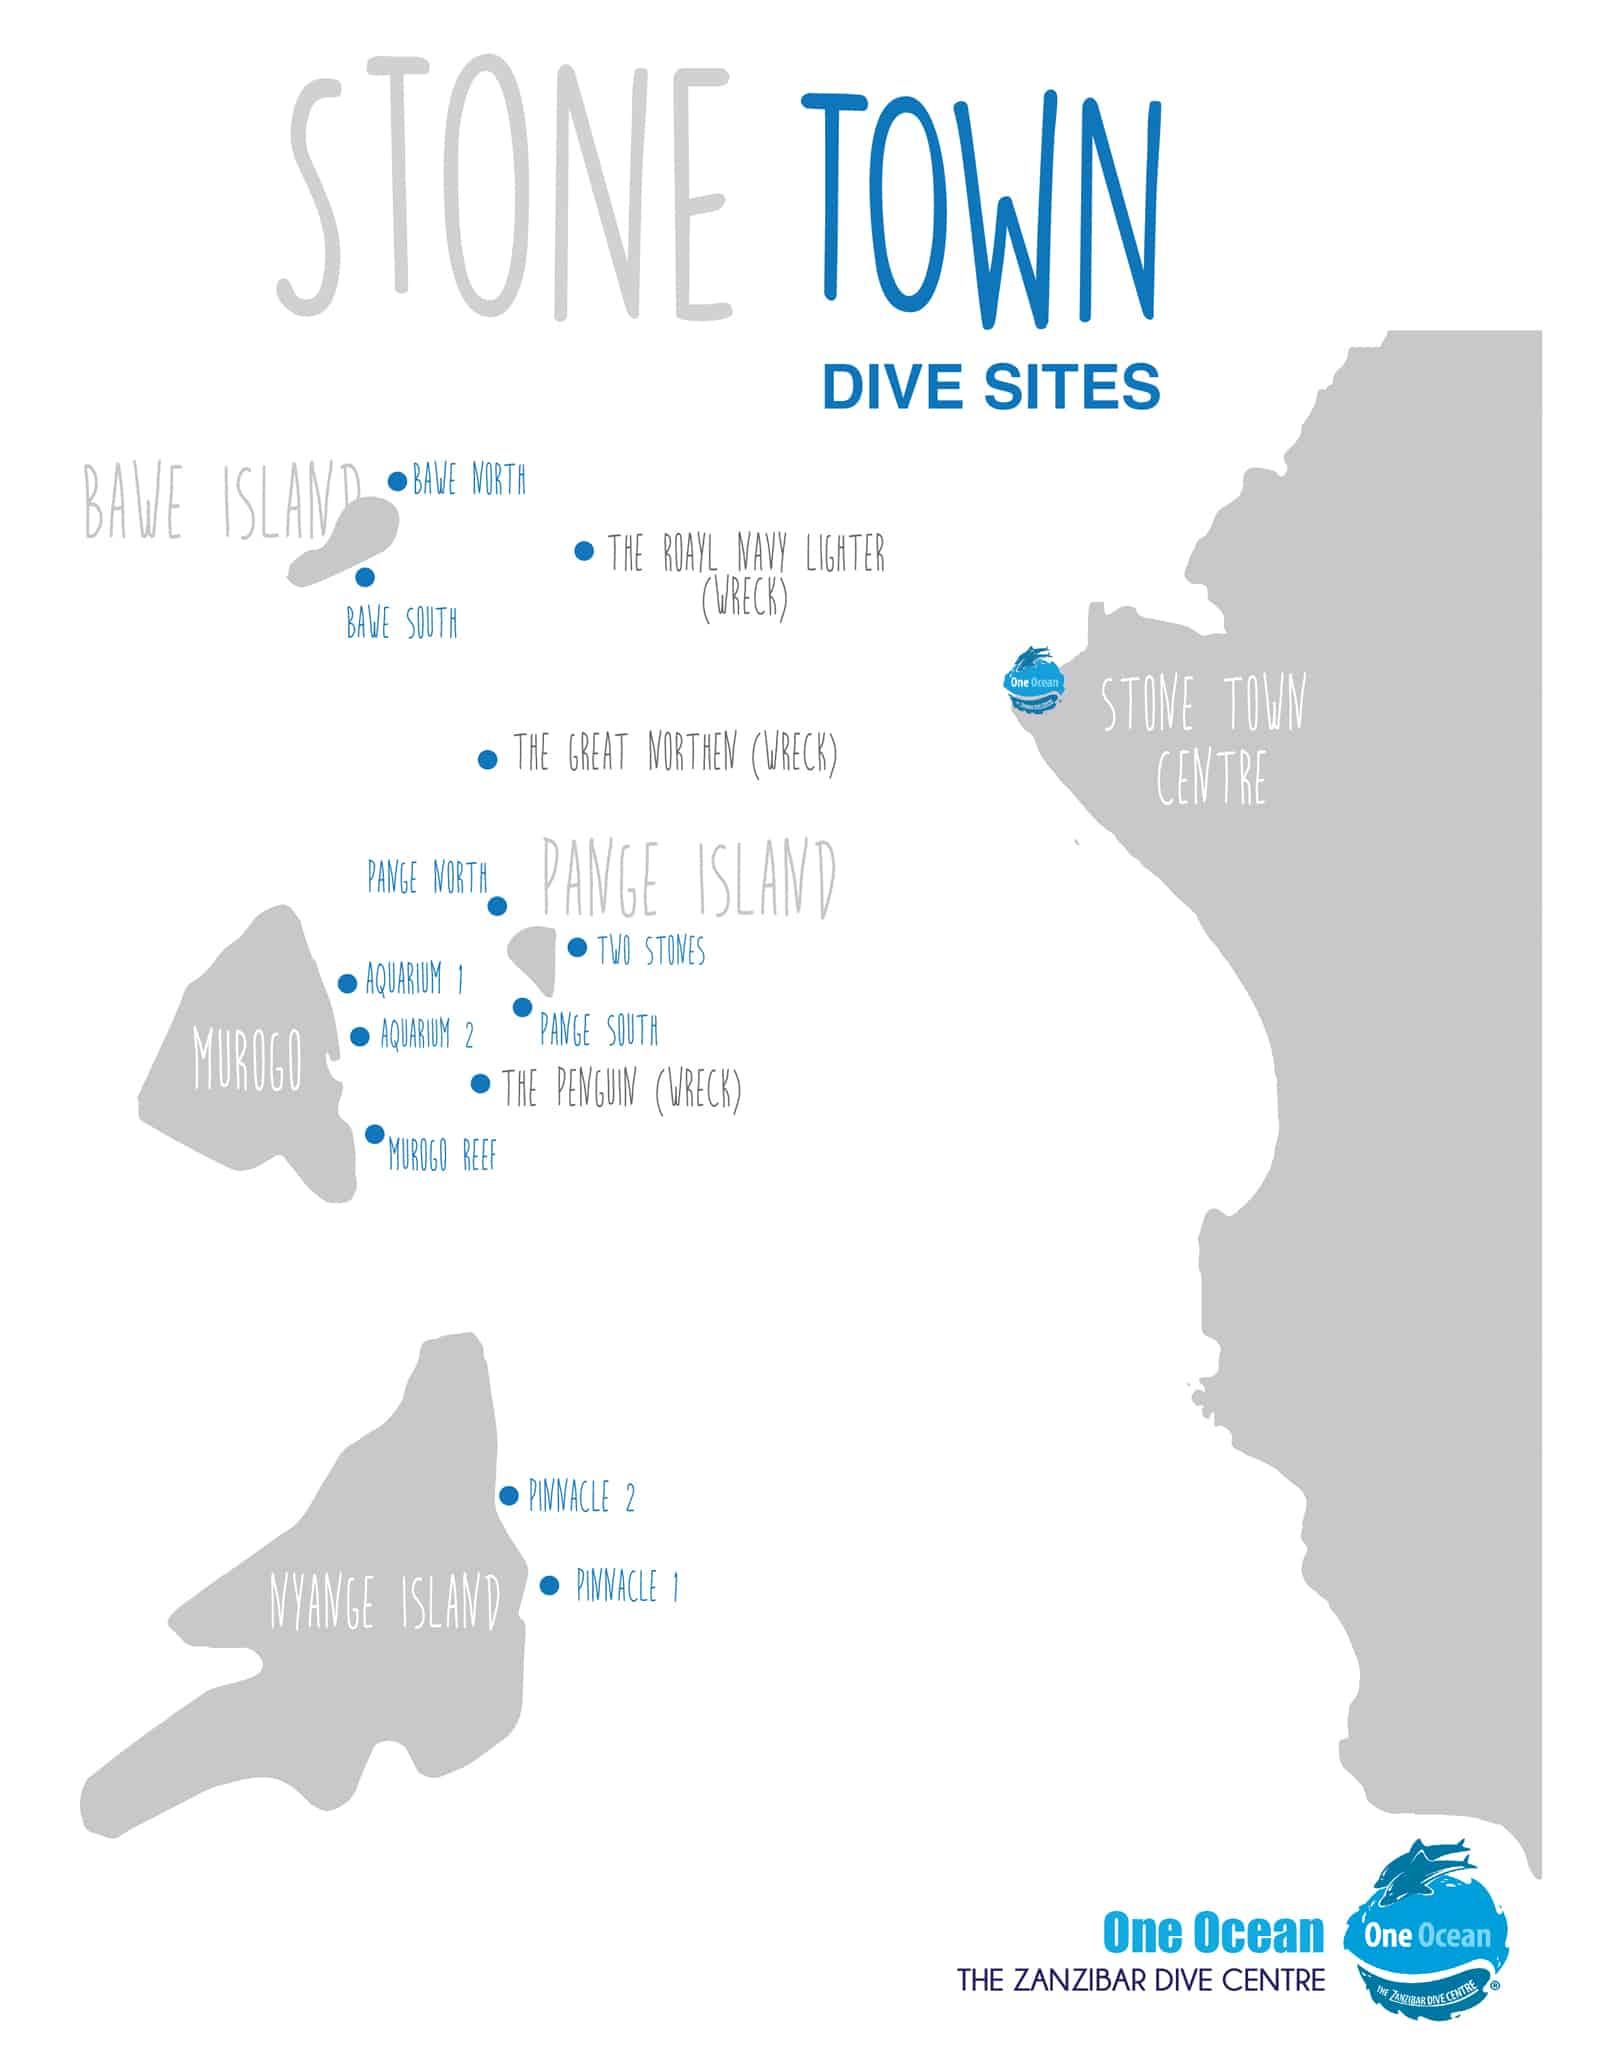 Stone Town dive sites